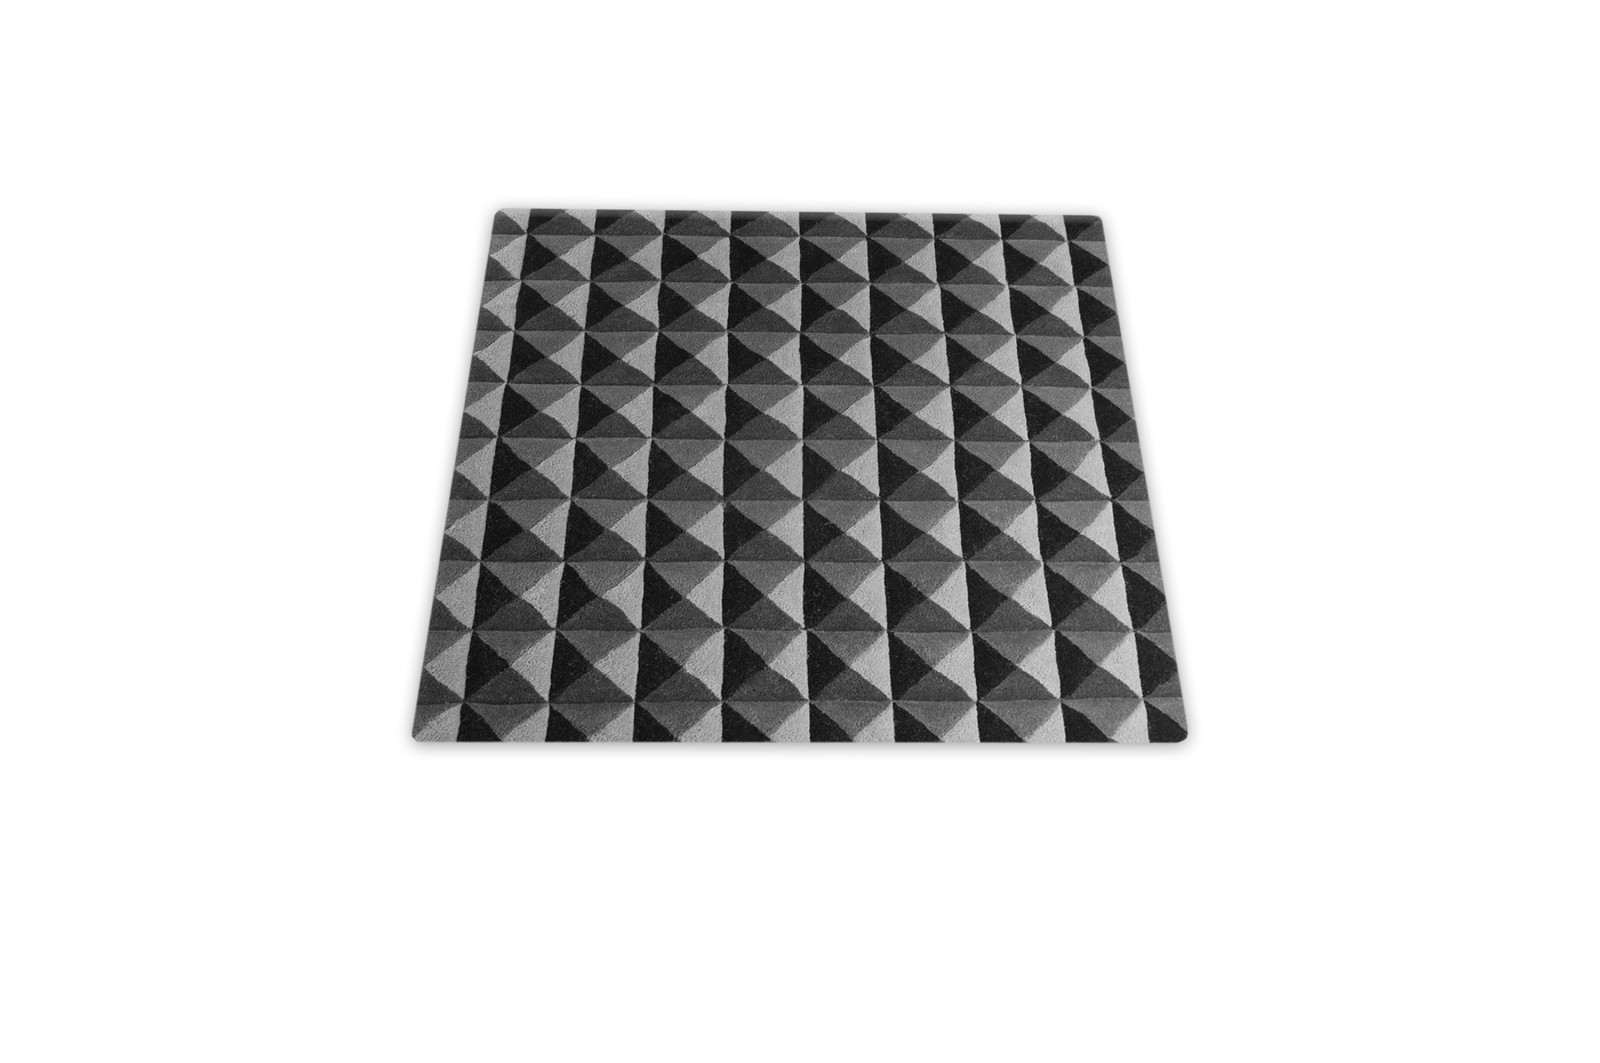 Knurled Square Rug Grey